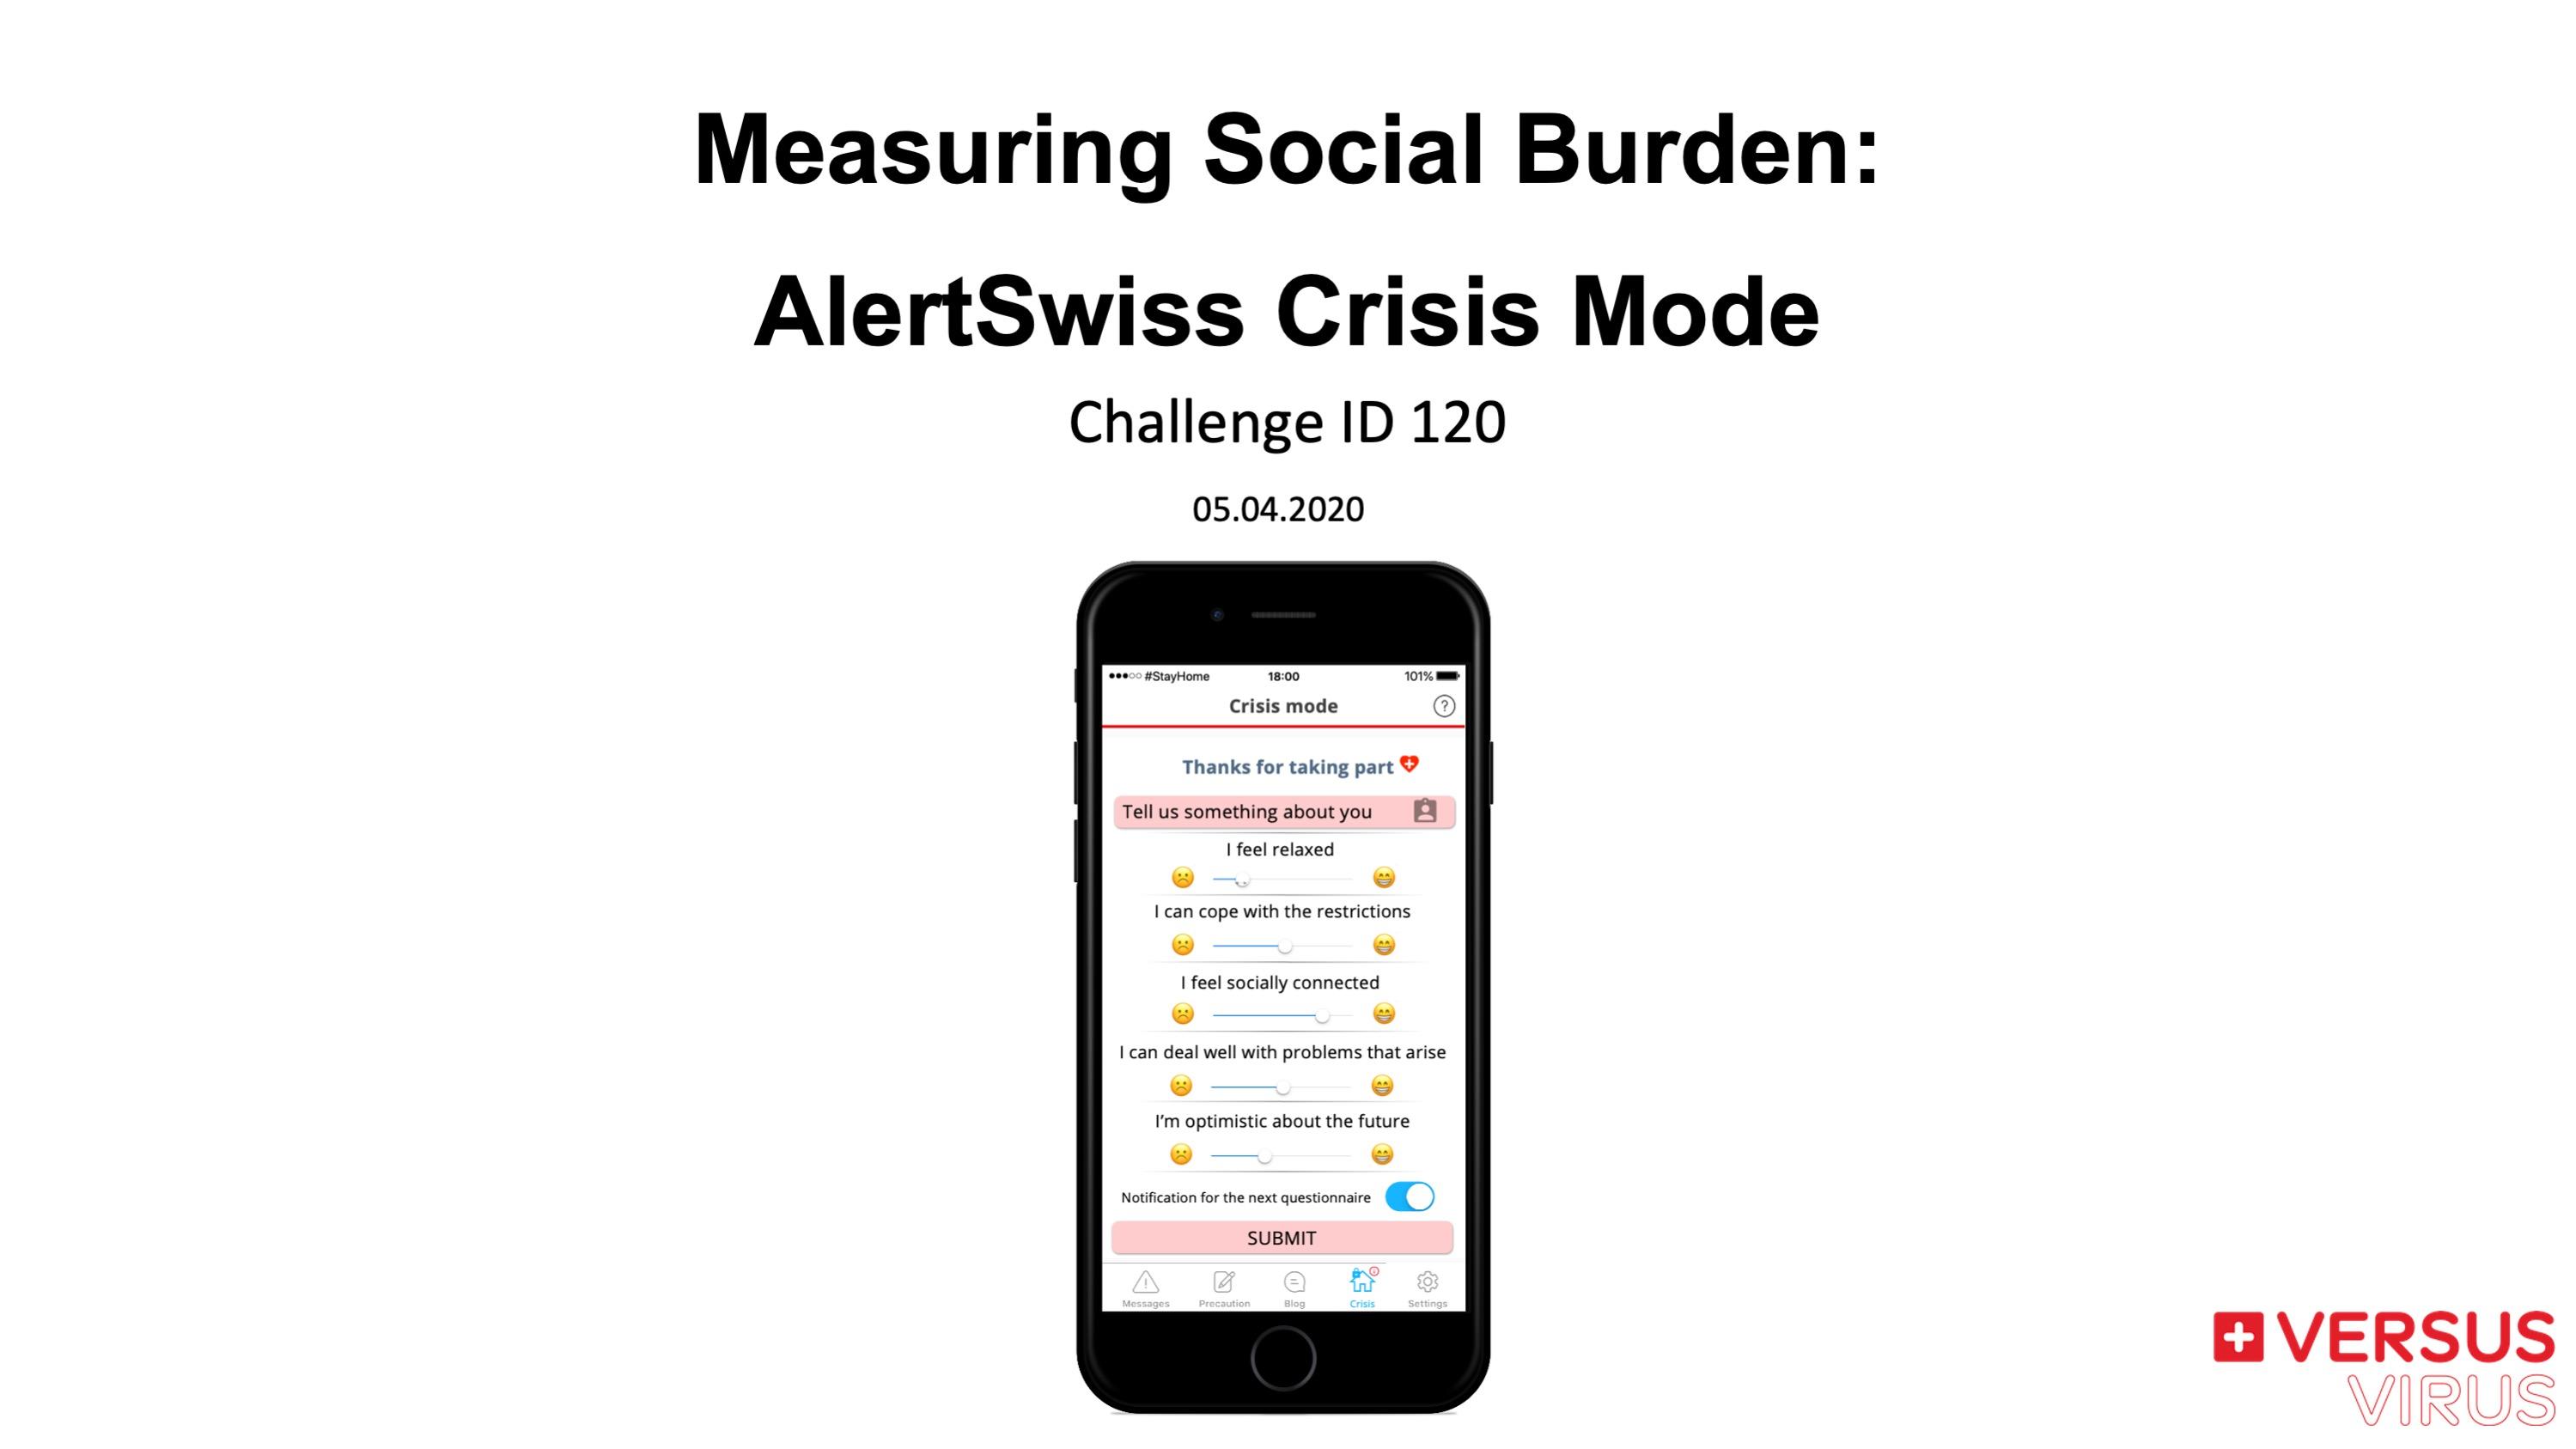 Measuring Social Burden: AlertSwiss Crisis Mode